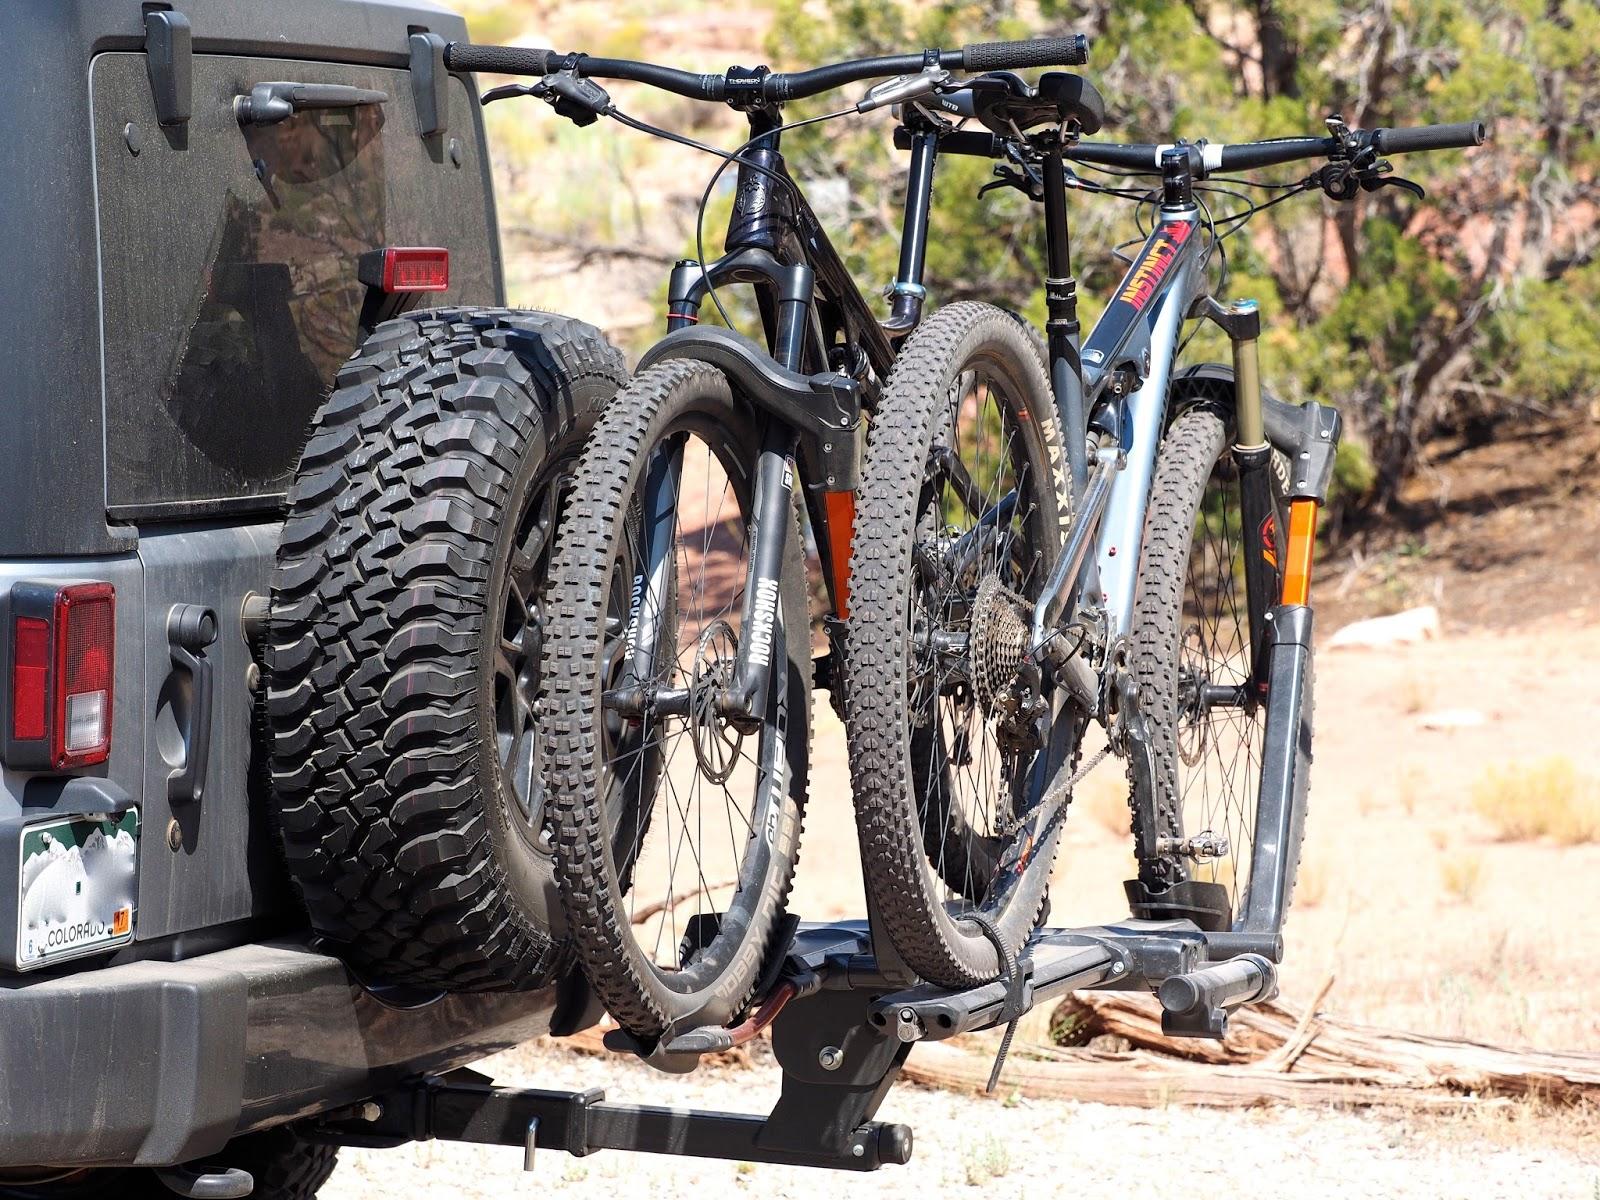 all cycle reviews rack sayeth kuat mounted img elemental nice racks bike up